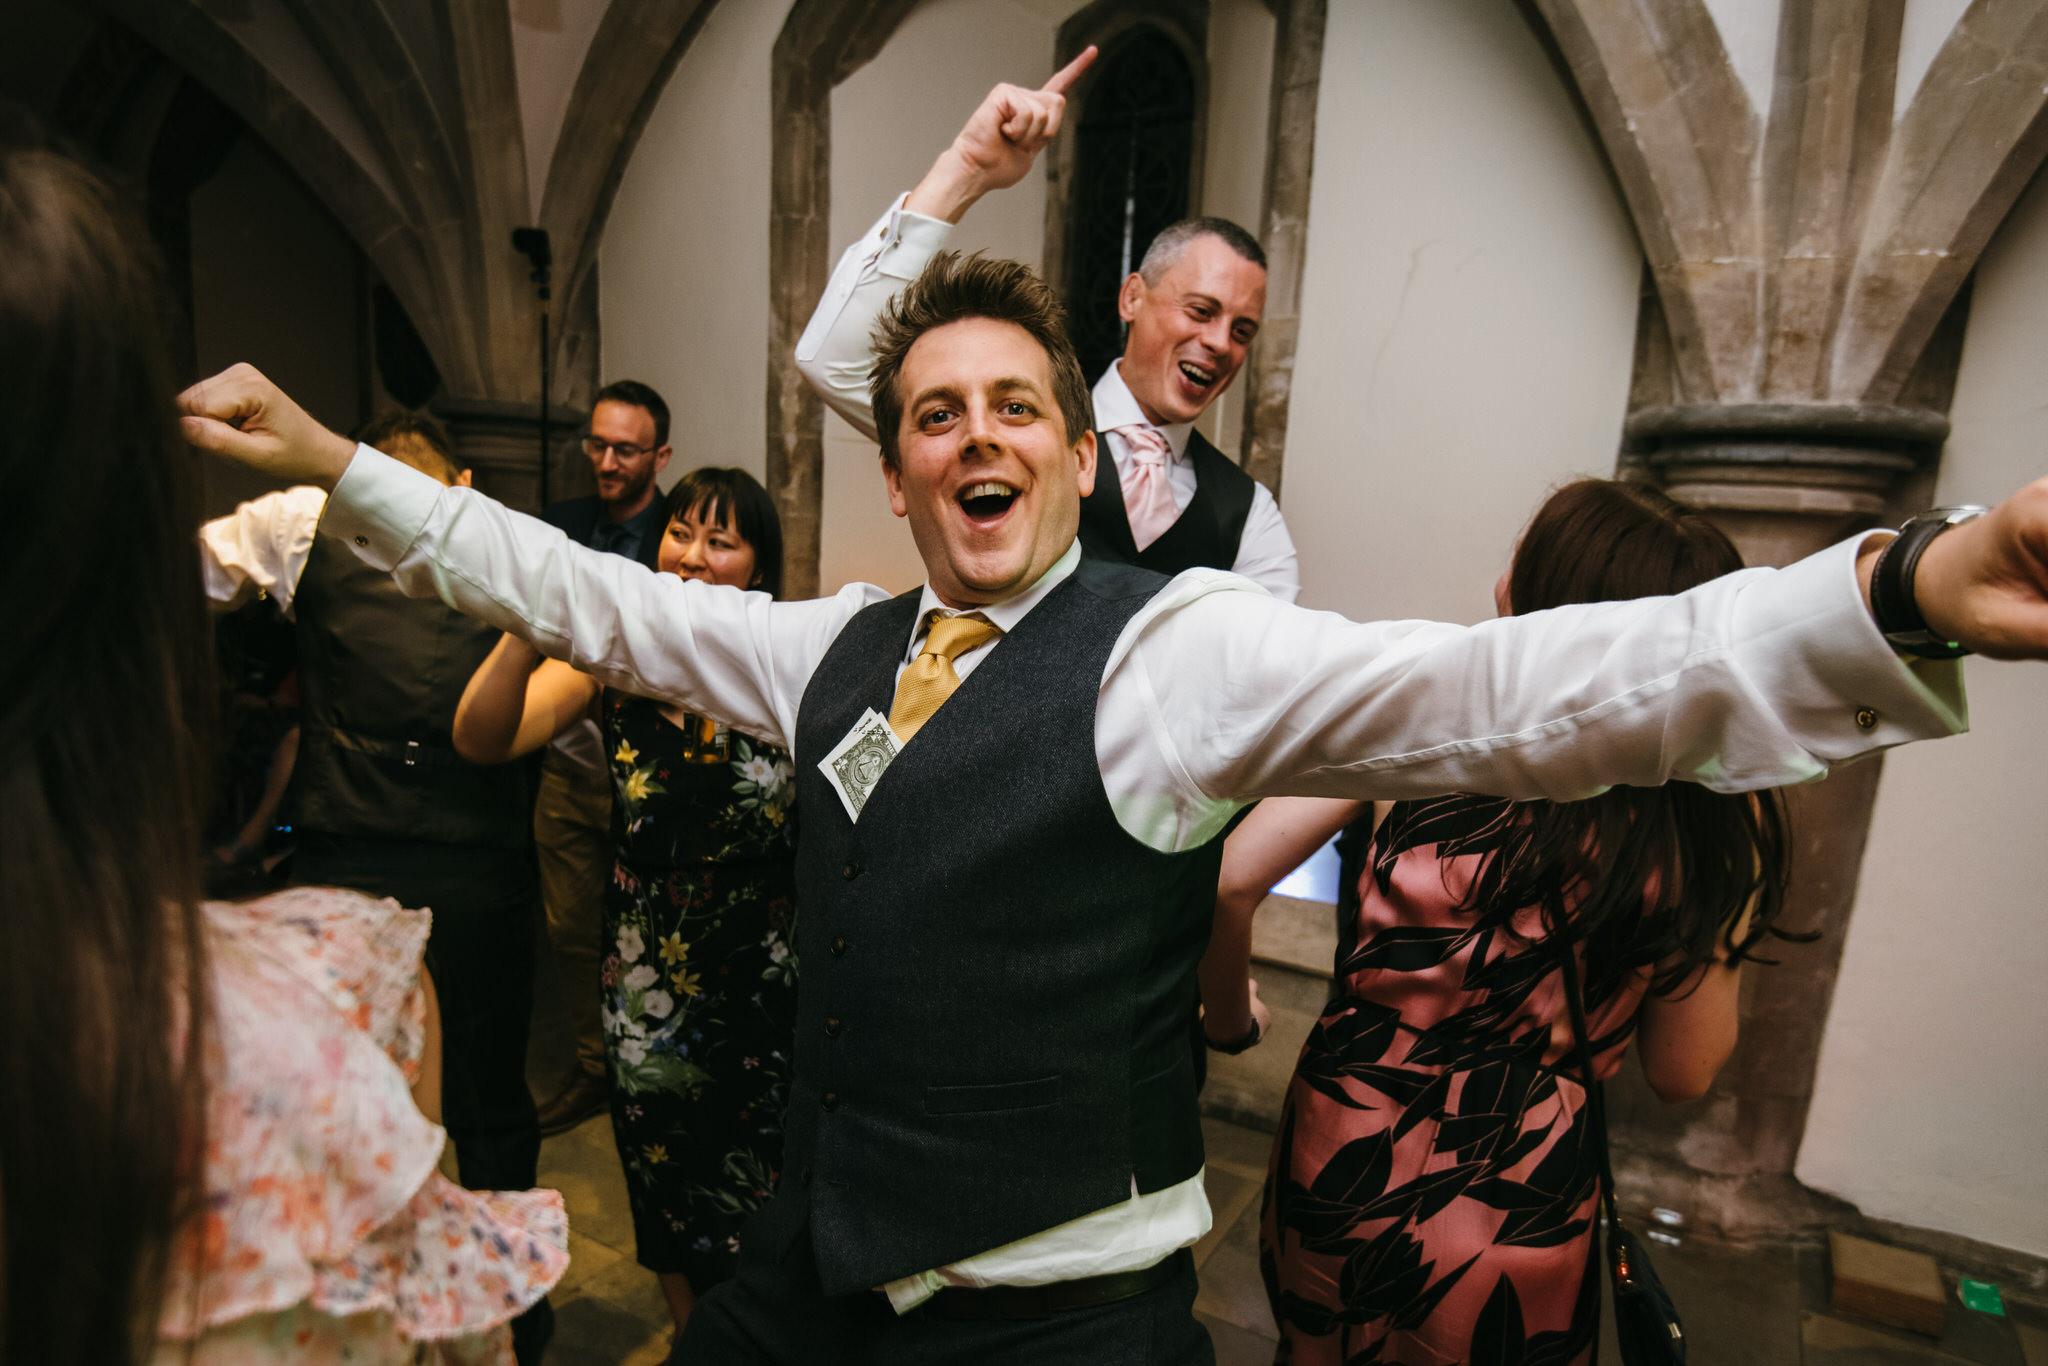 Dance floor fun at a Bishops palace wedding